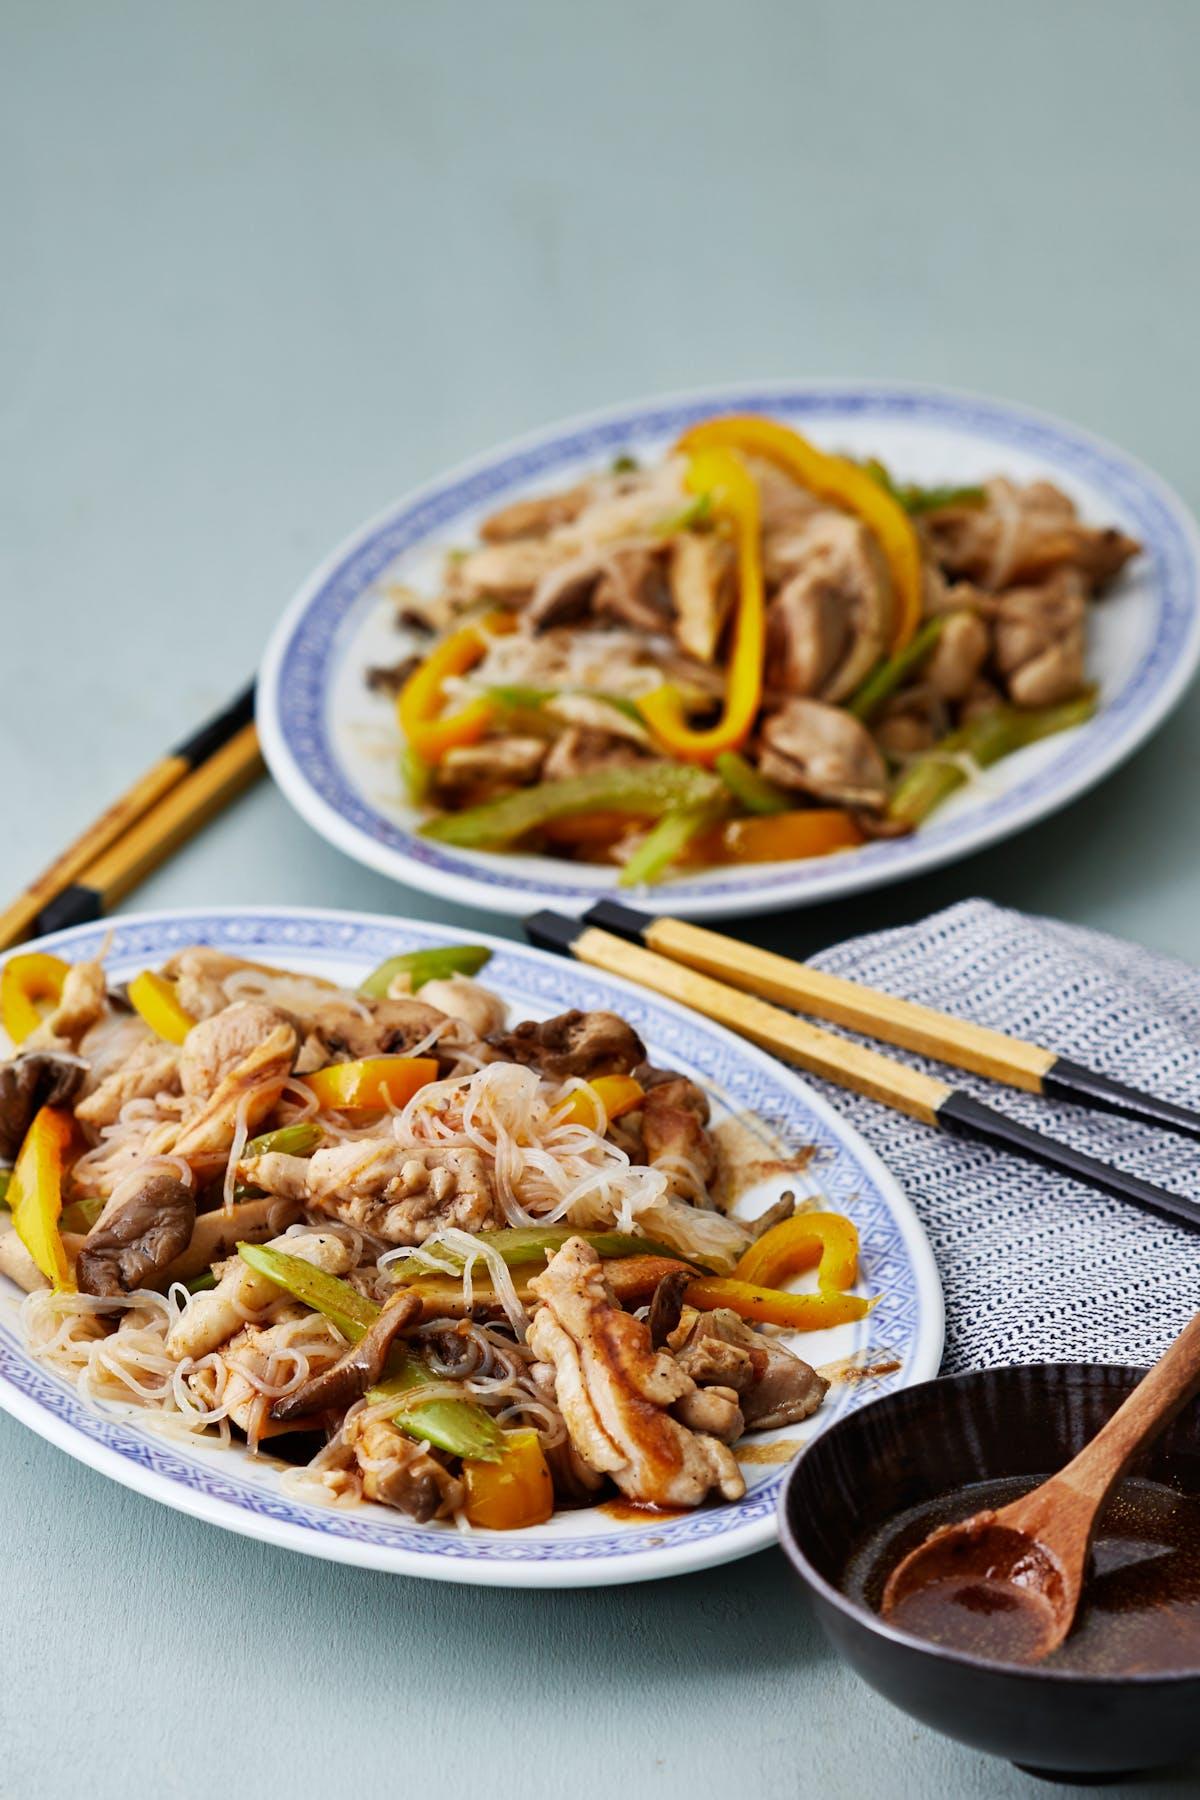 Keto Noodles Recipe for Low Carb Egg Noodles